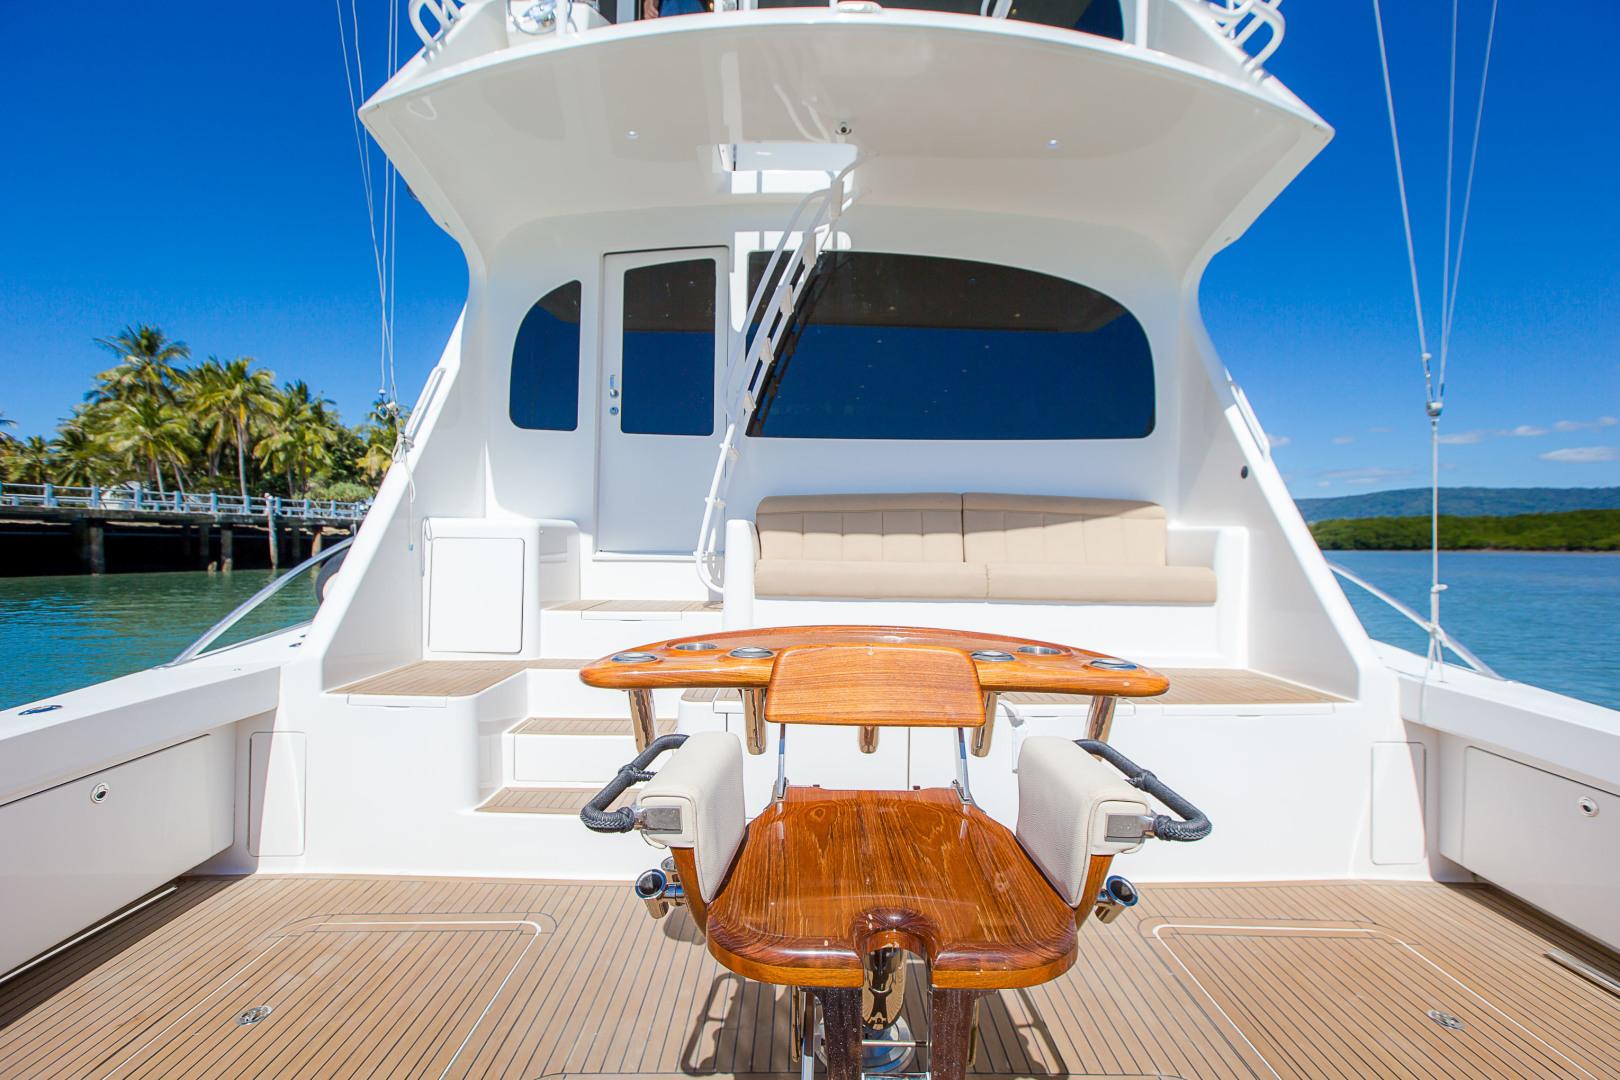 Viking-76 Enclosed Skybridge 2012-Reel Power Palm Beach-Florida-United States-1346555   Thumbnail